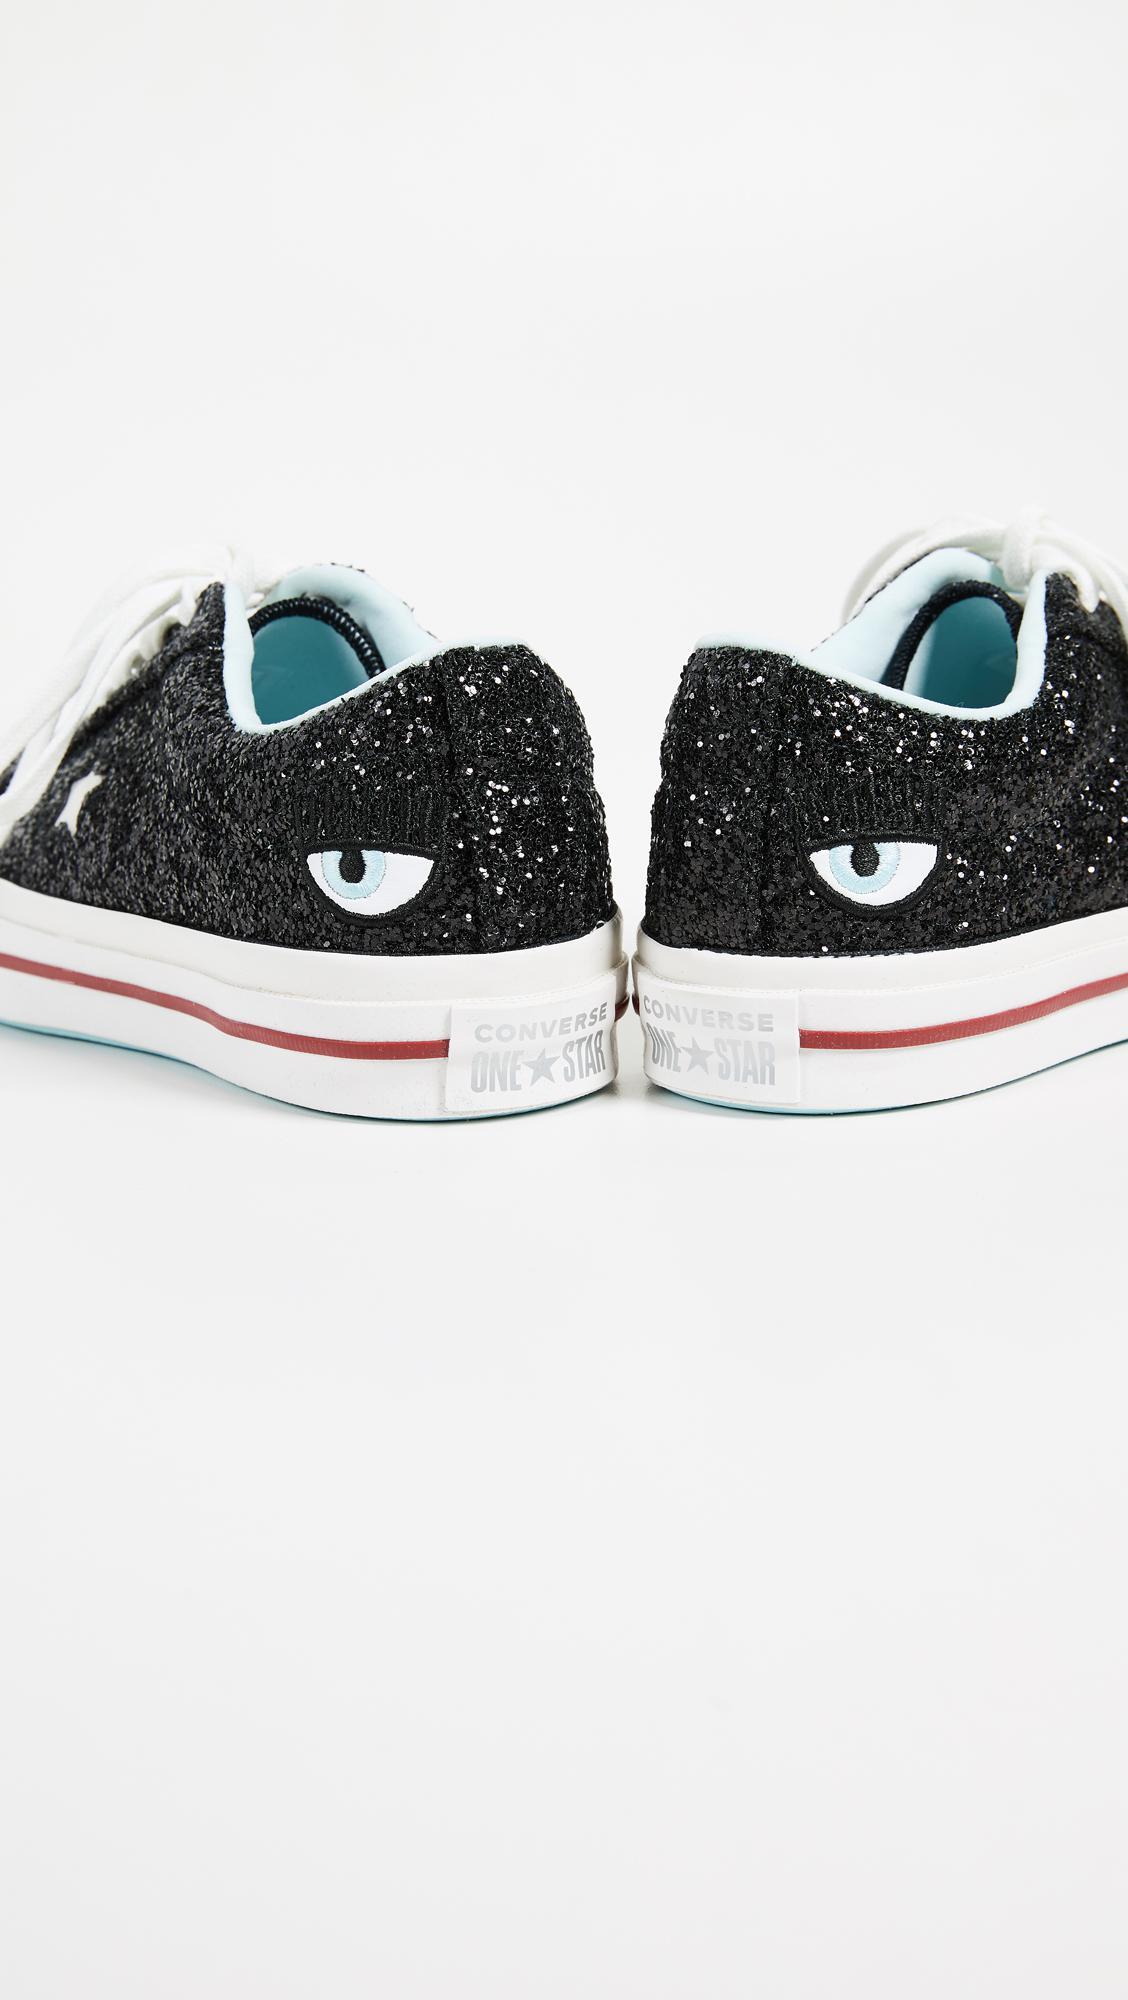 0fc8bb75477d Lyst - Converse One Star X Chiara Ferragni Lace Up Sneakers in Black